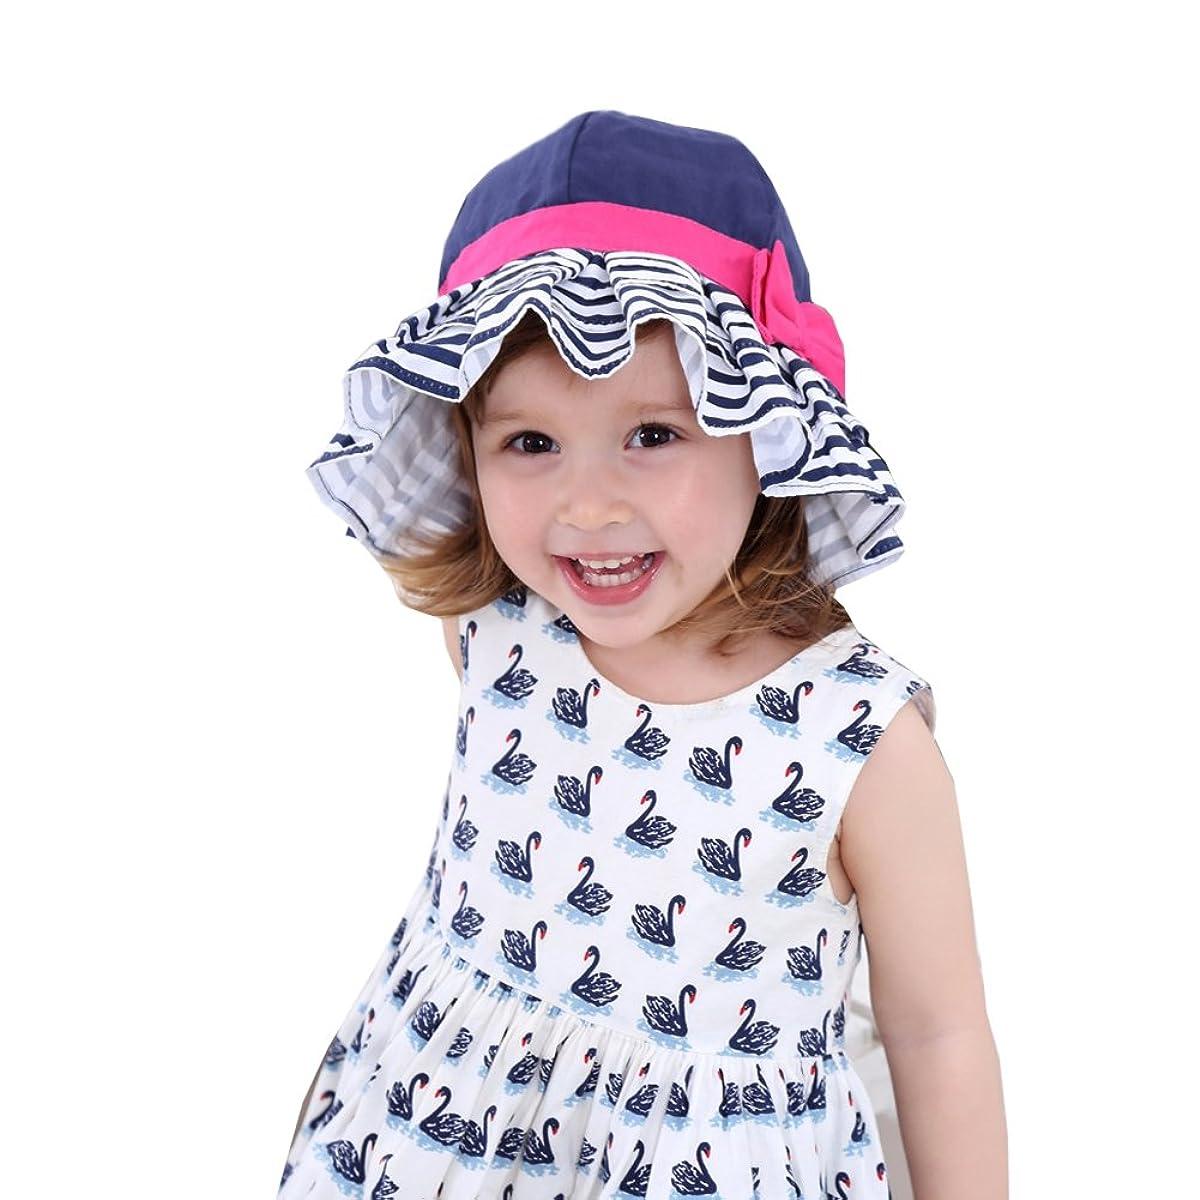 Baby Floppy Sun Hat UPF 50+, Highest Certified UV Sun Protection,Summer Outdoor,Beach Sun Hats